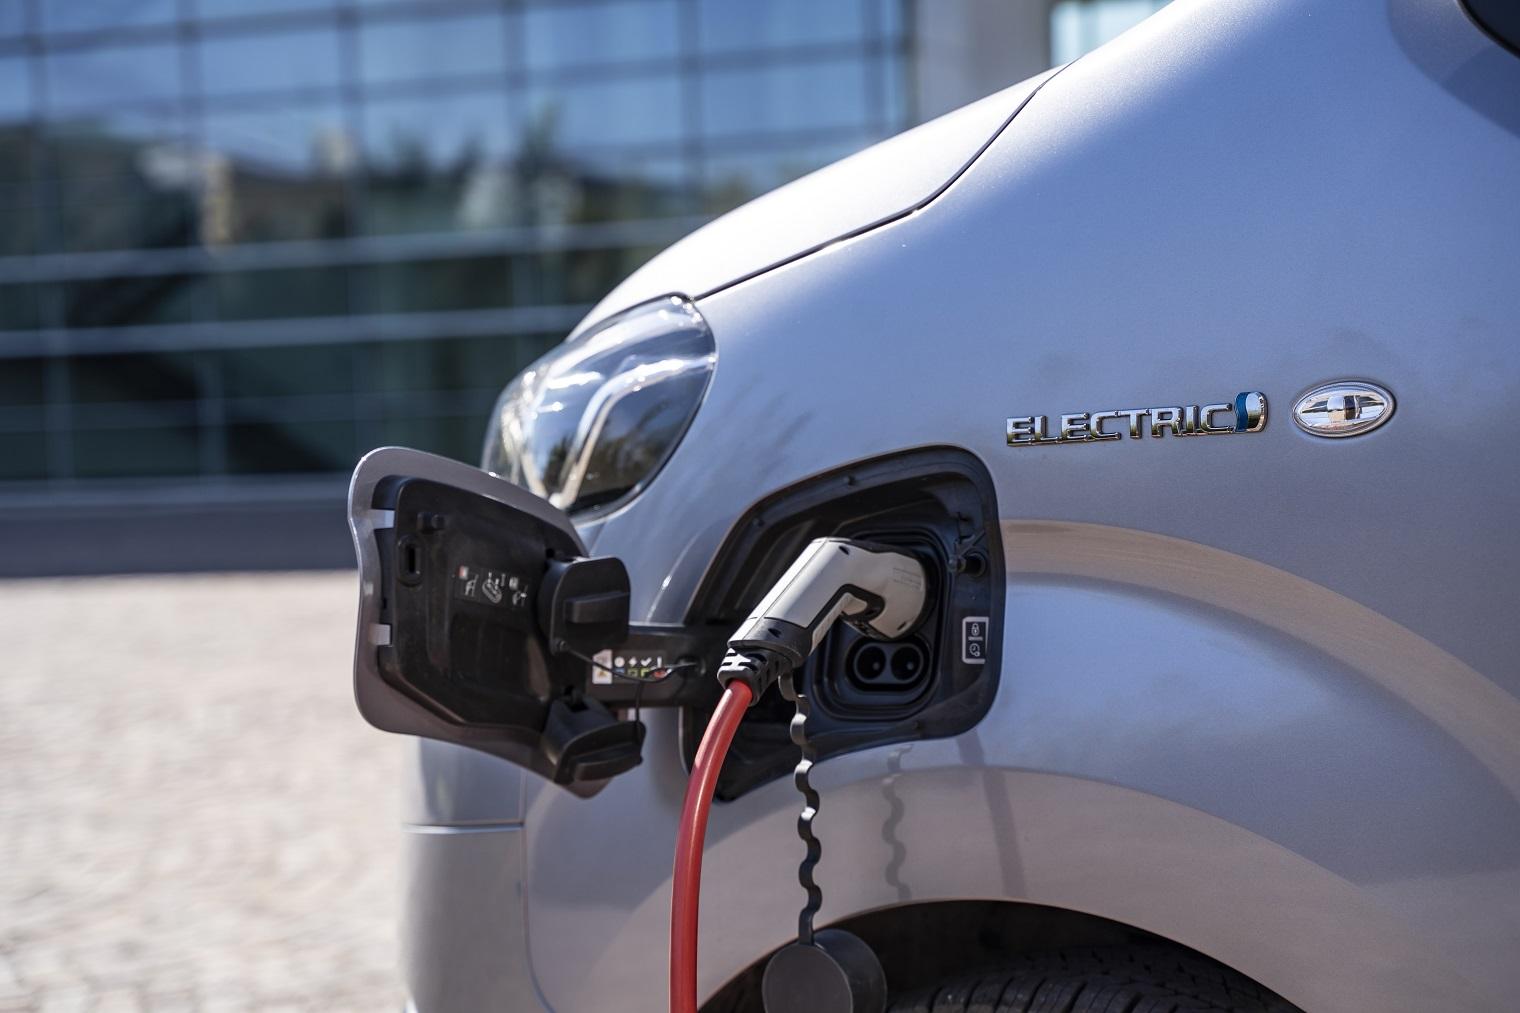 nuovo Toyota Proace Electric 2021 ricarica